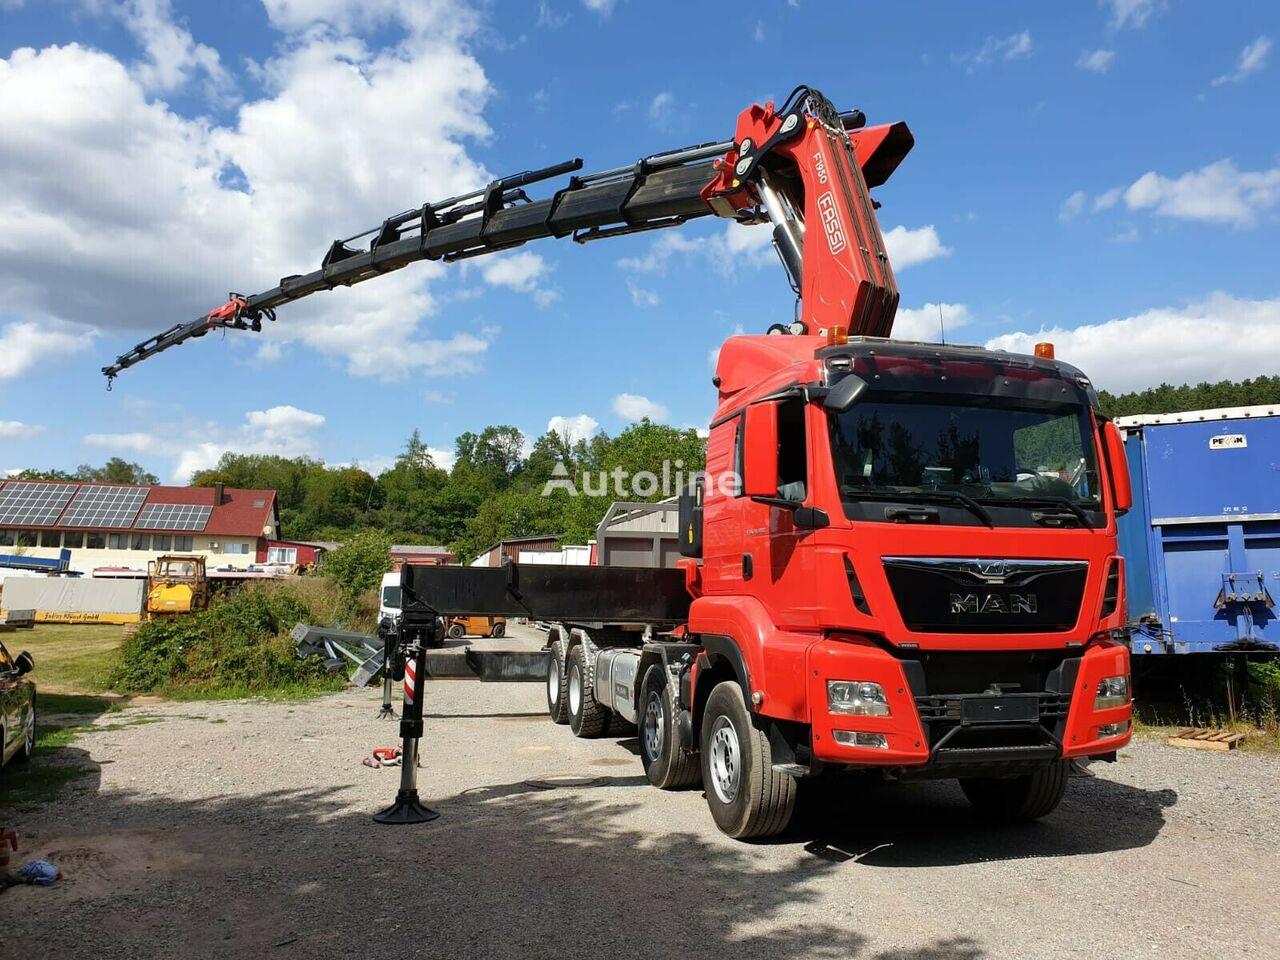 MAN TGS 35.480 SOFORT VERFÜGBAR flatbed truck